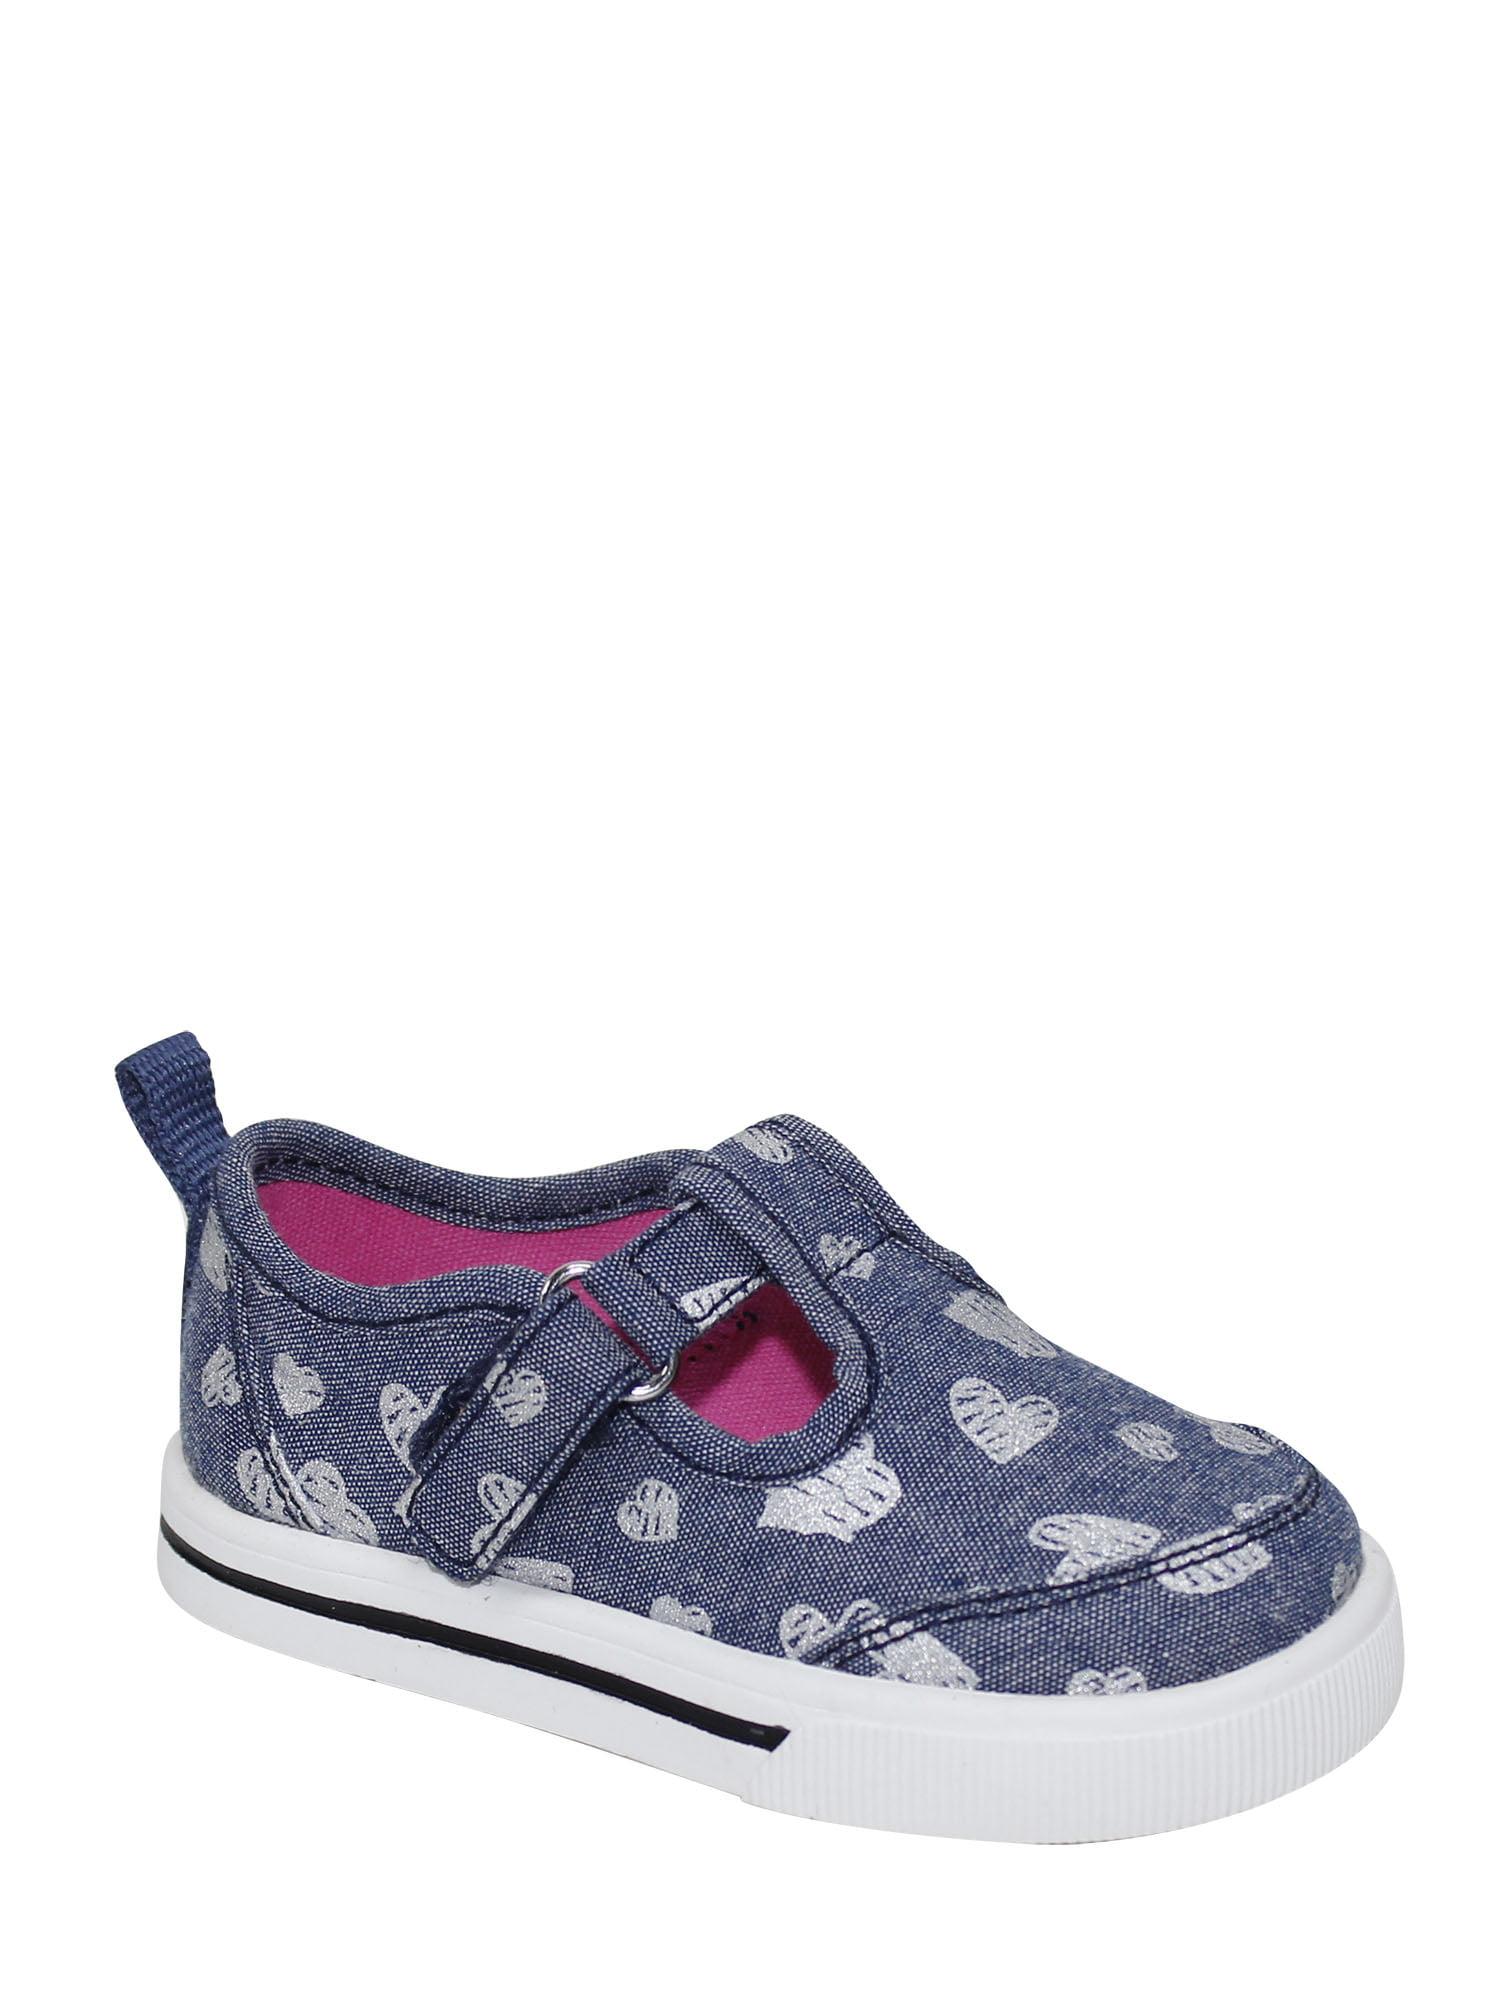 Wonder Nation Infant Girl Hear T-strap Casual Shoes